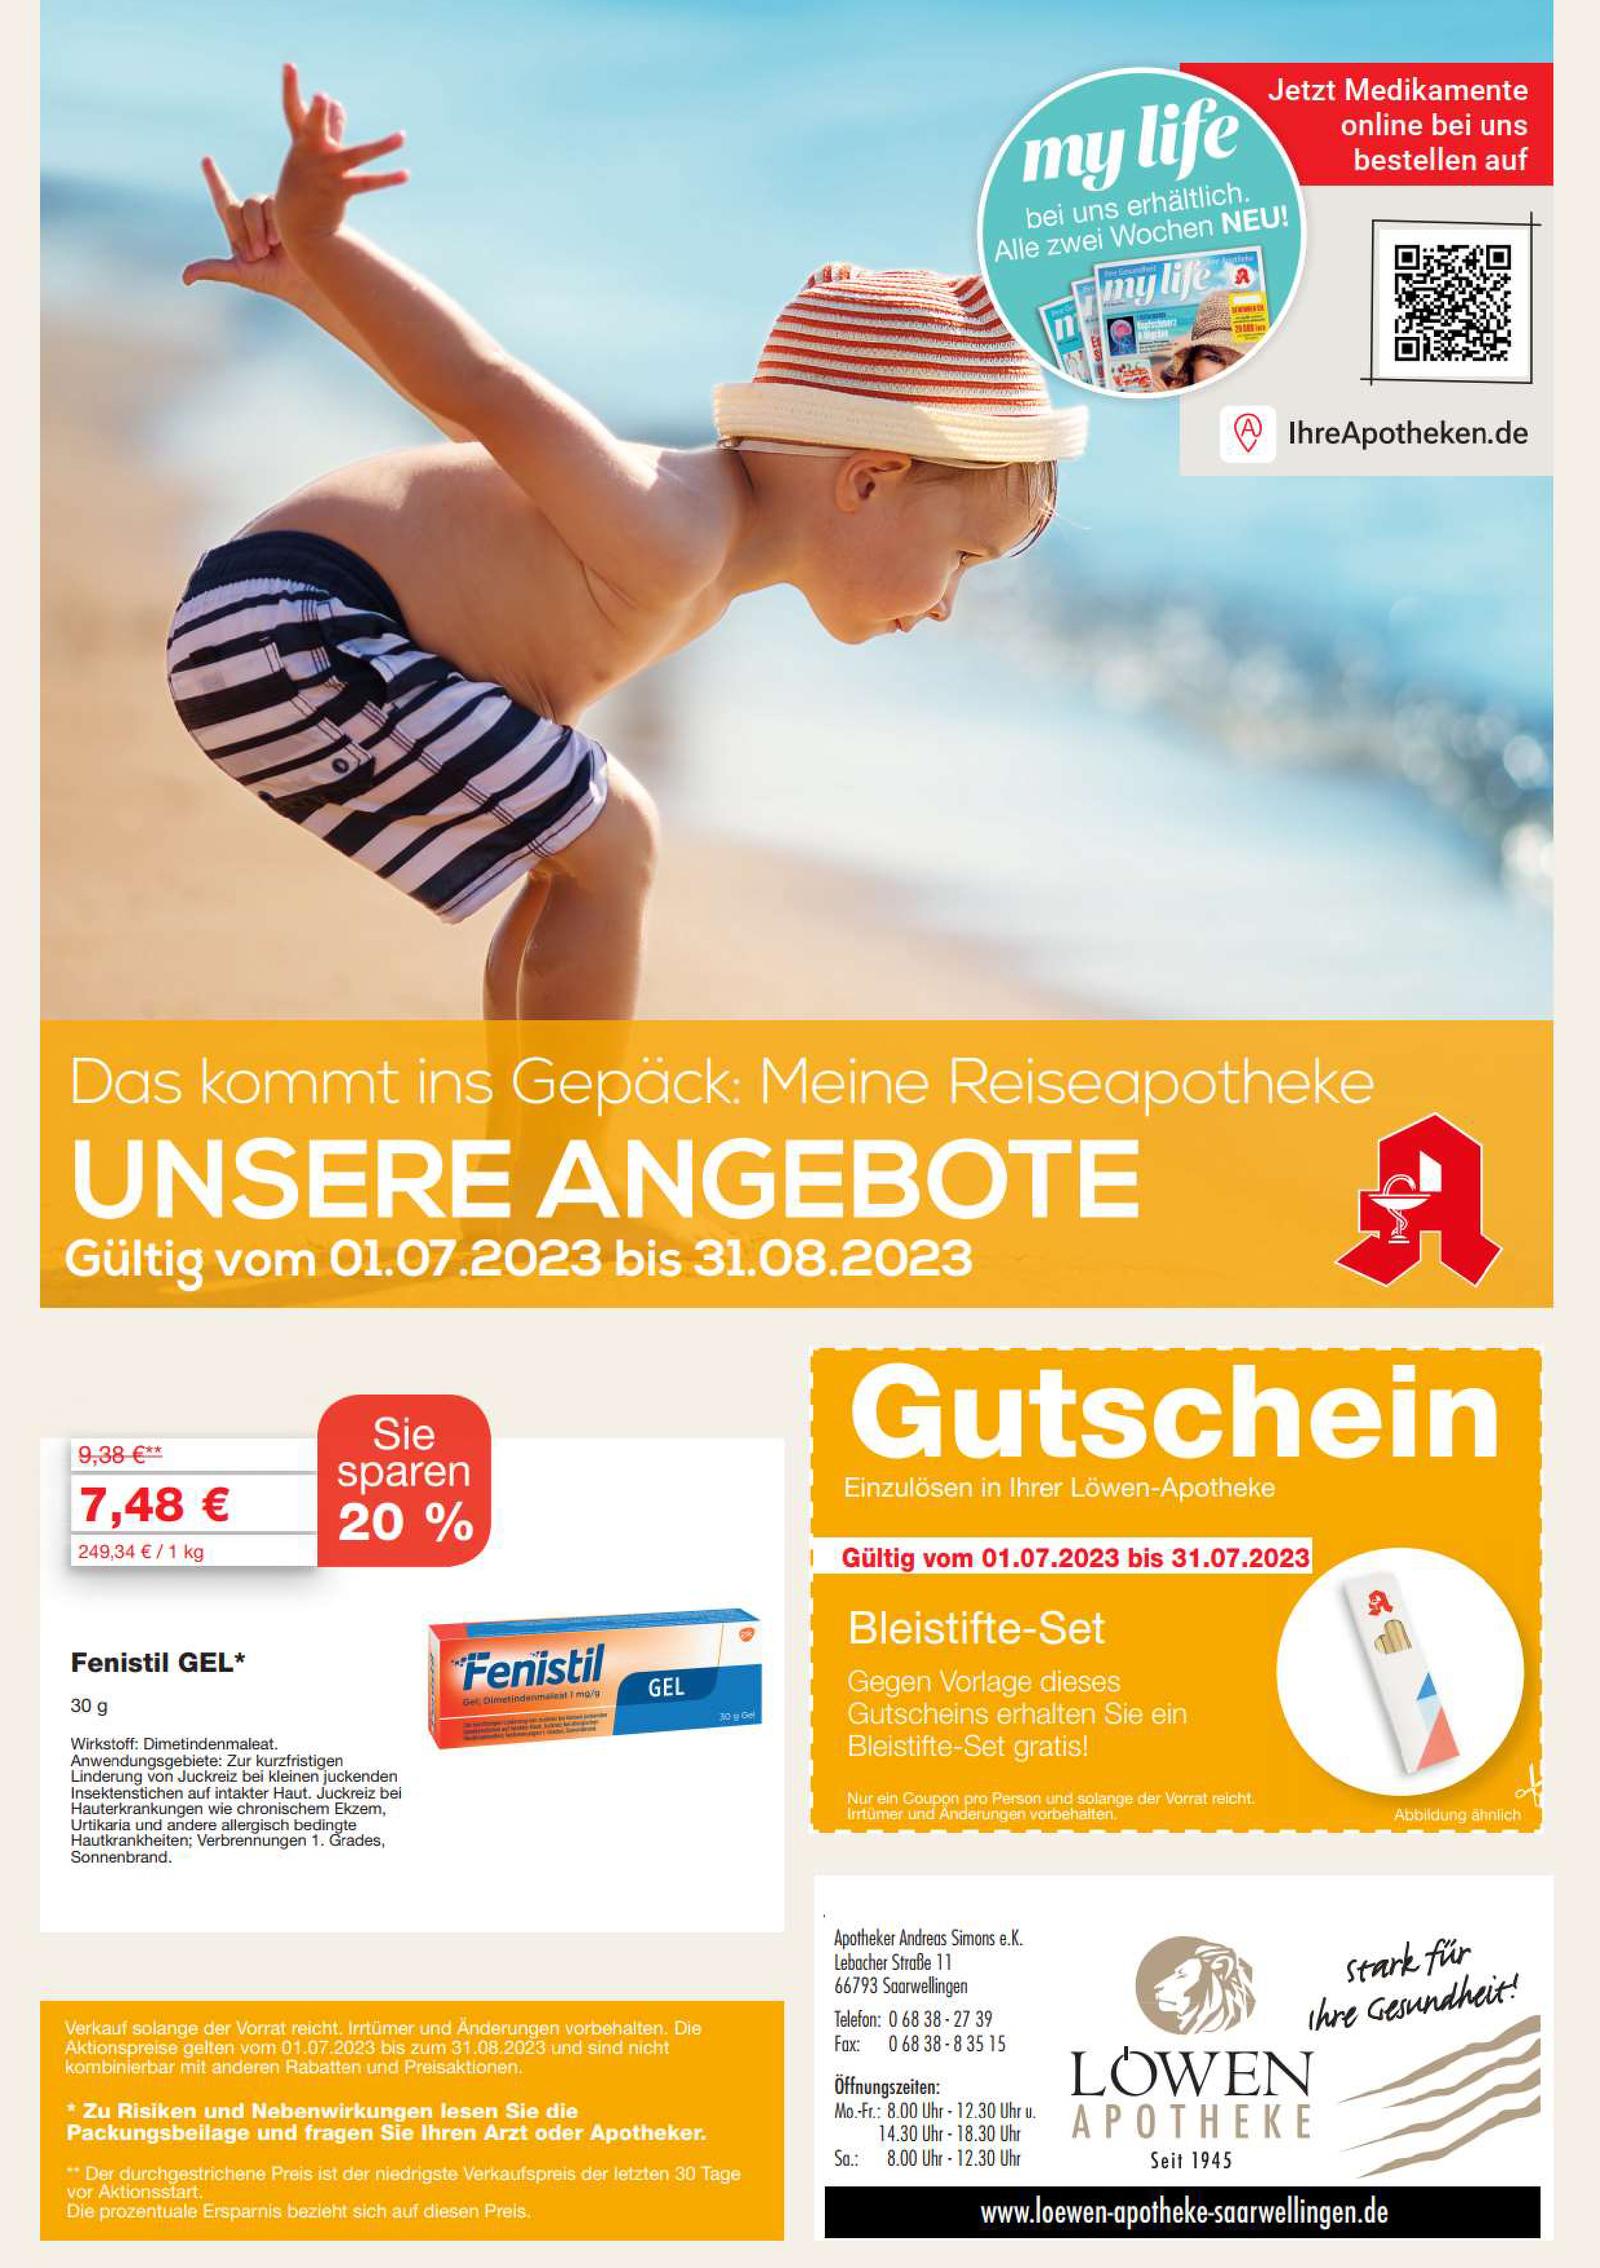 https://mein-uploads.apocdn.net/20510/leaflets/20510_flyer-Seite1.png